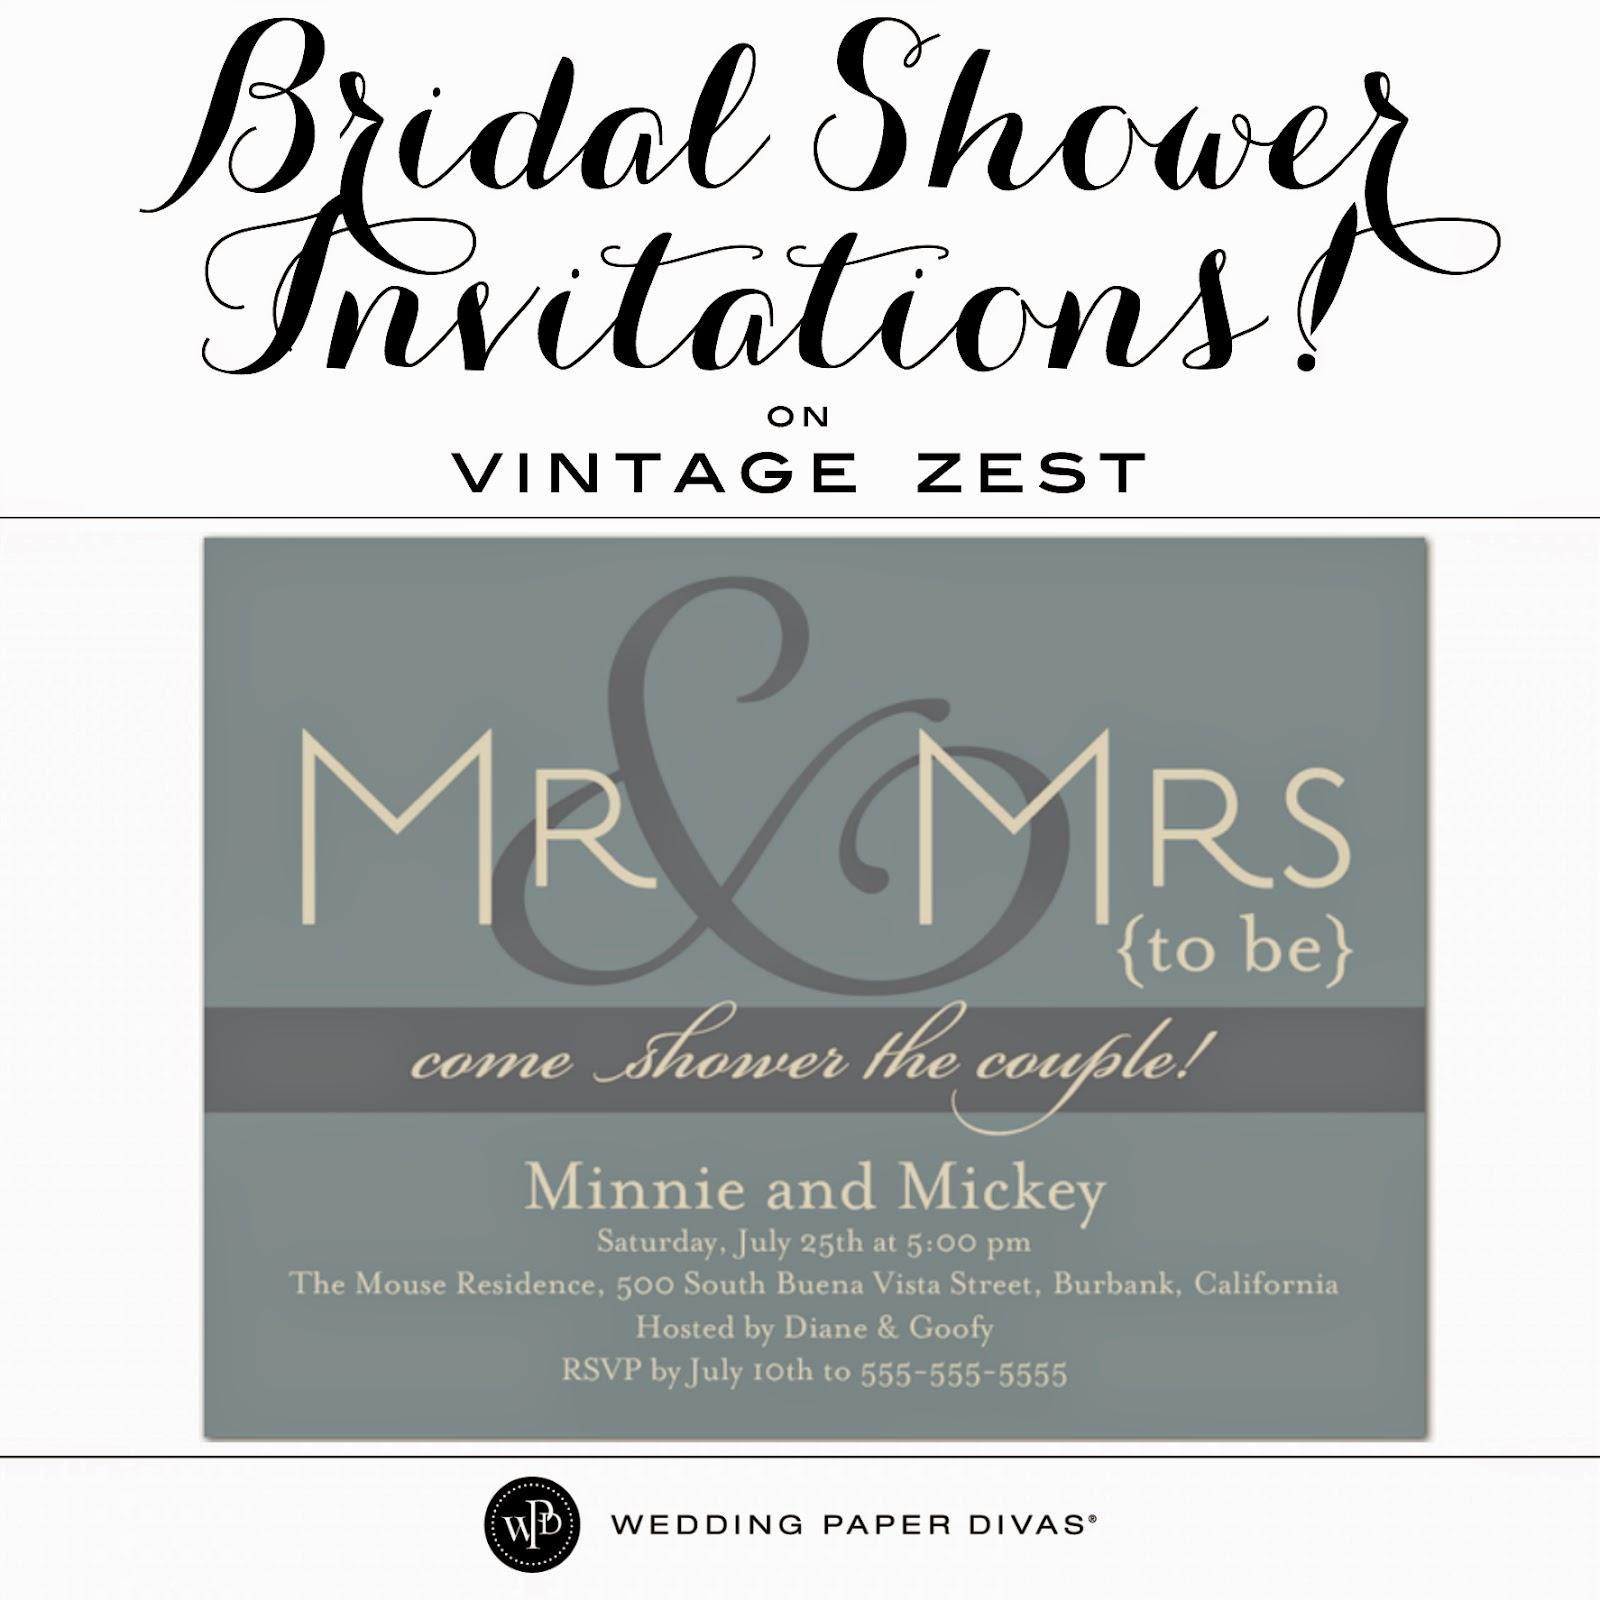 Wedding Diva Invitations: Bridal Shower Invitations With Wedding Paper Divas